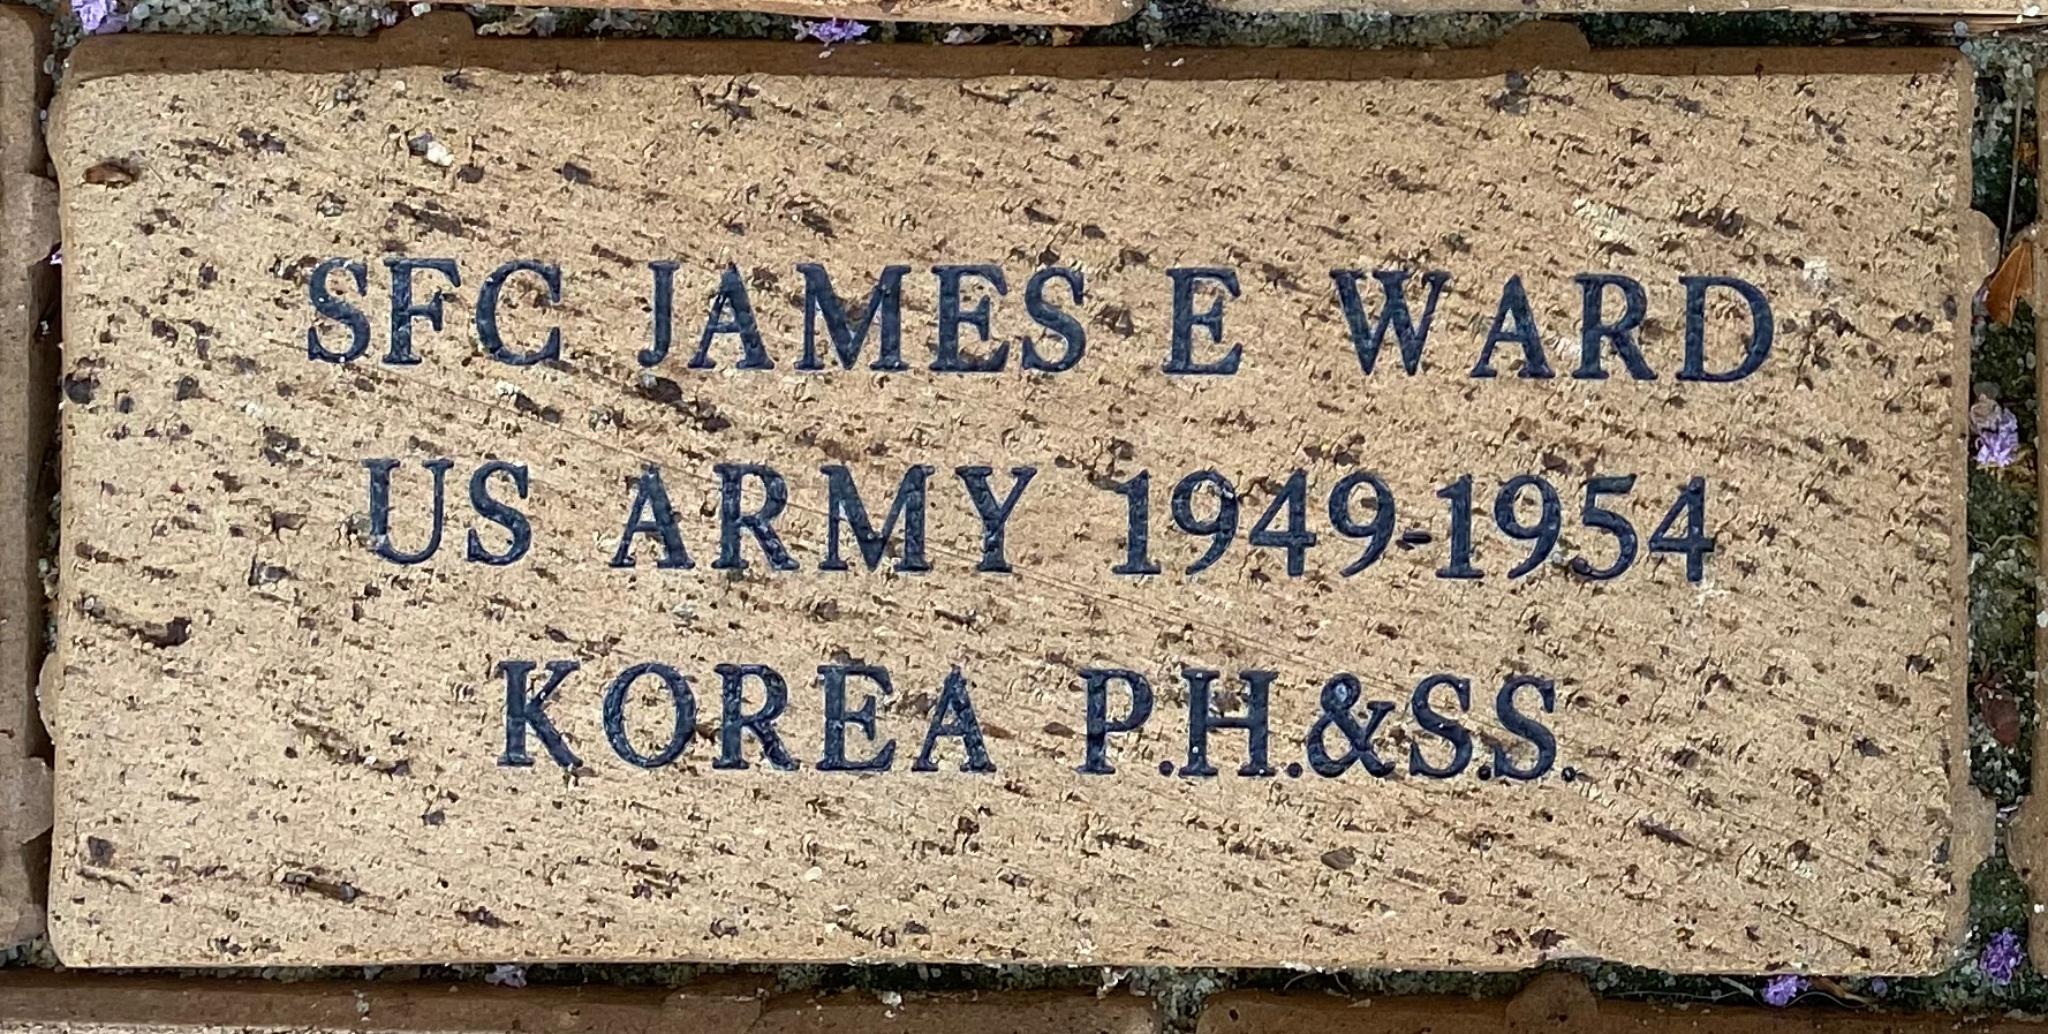 SFC JAMES E WARD US ARMY 1949- 1954 KOREA P.H. & S.S.